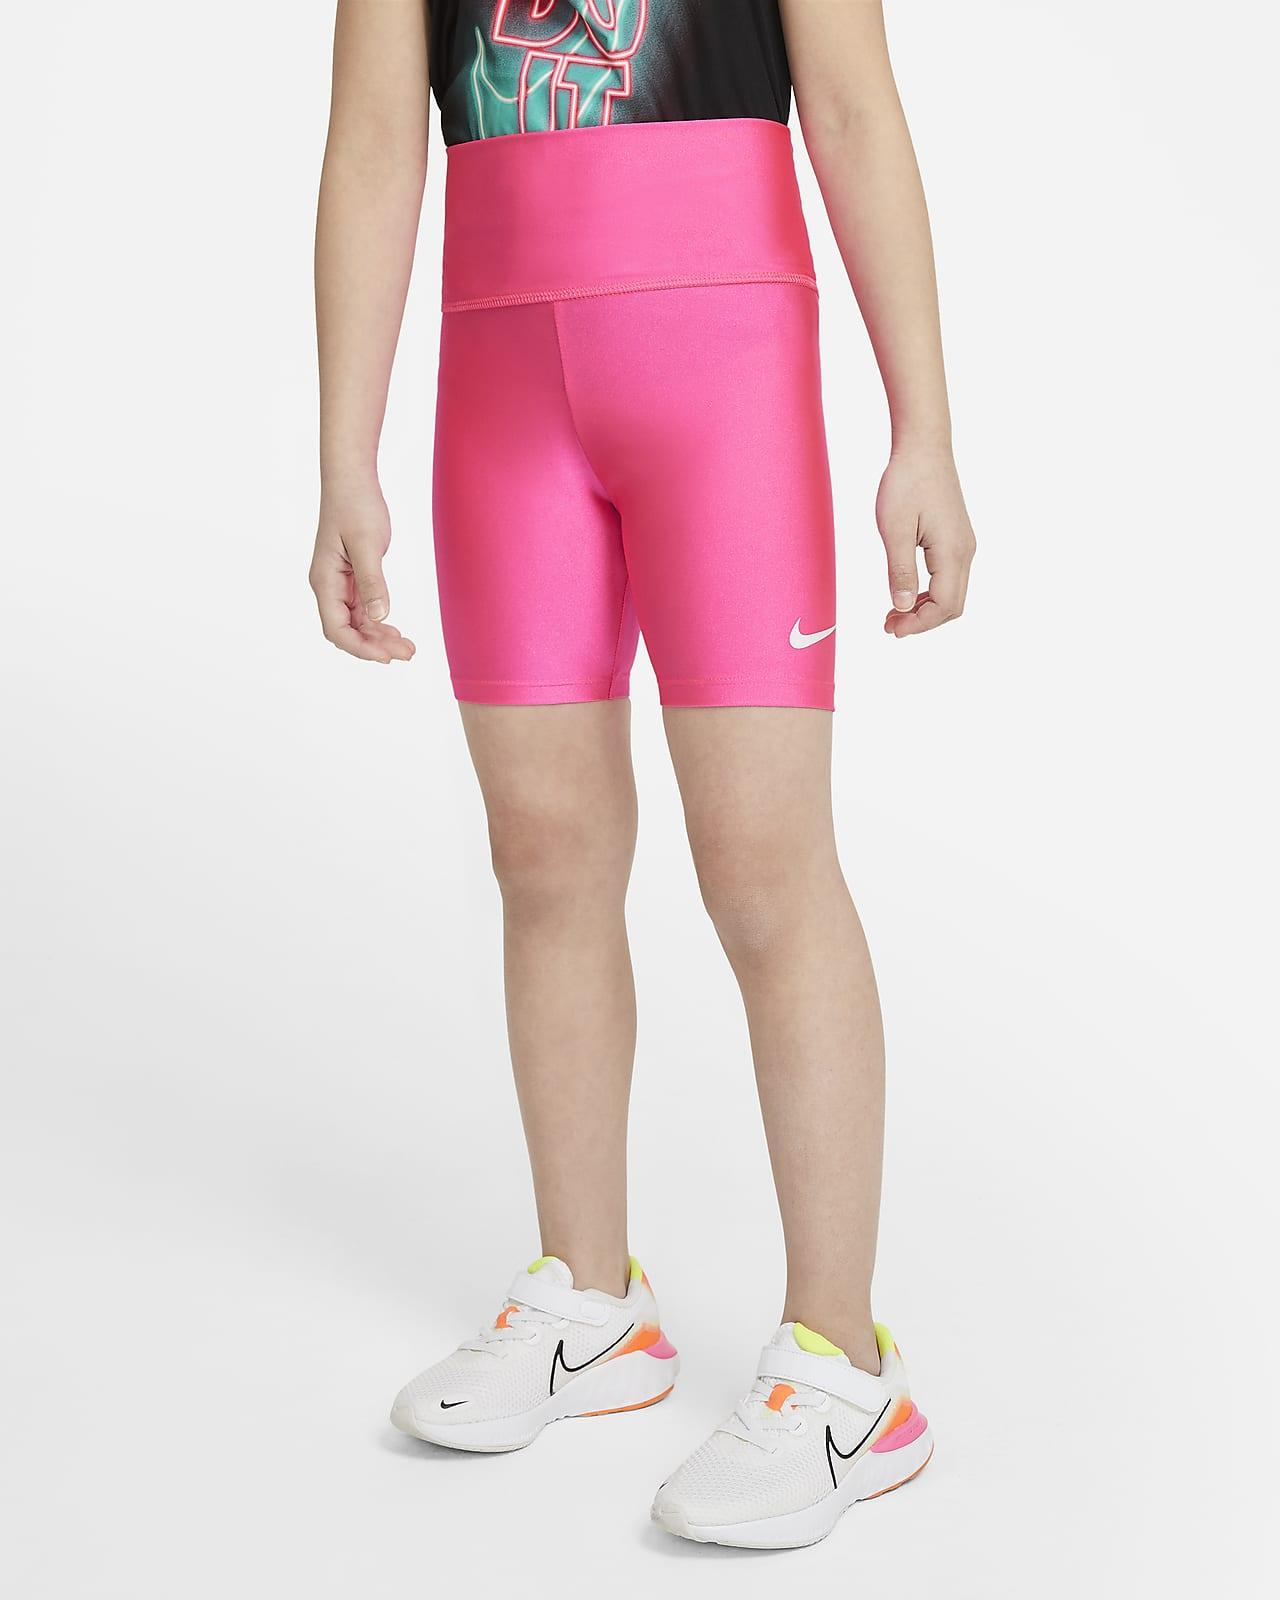 Nike Little Kids' High-Waisted Shorts